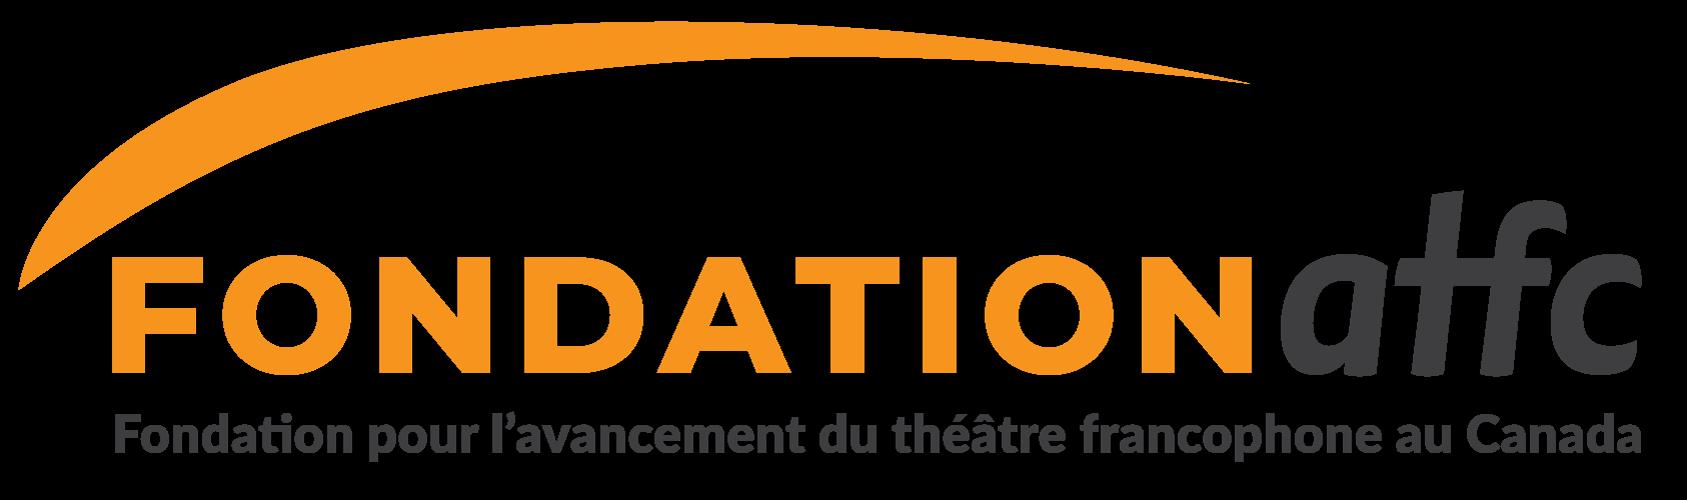 Logo fatfc cmyk